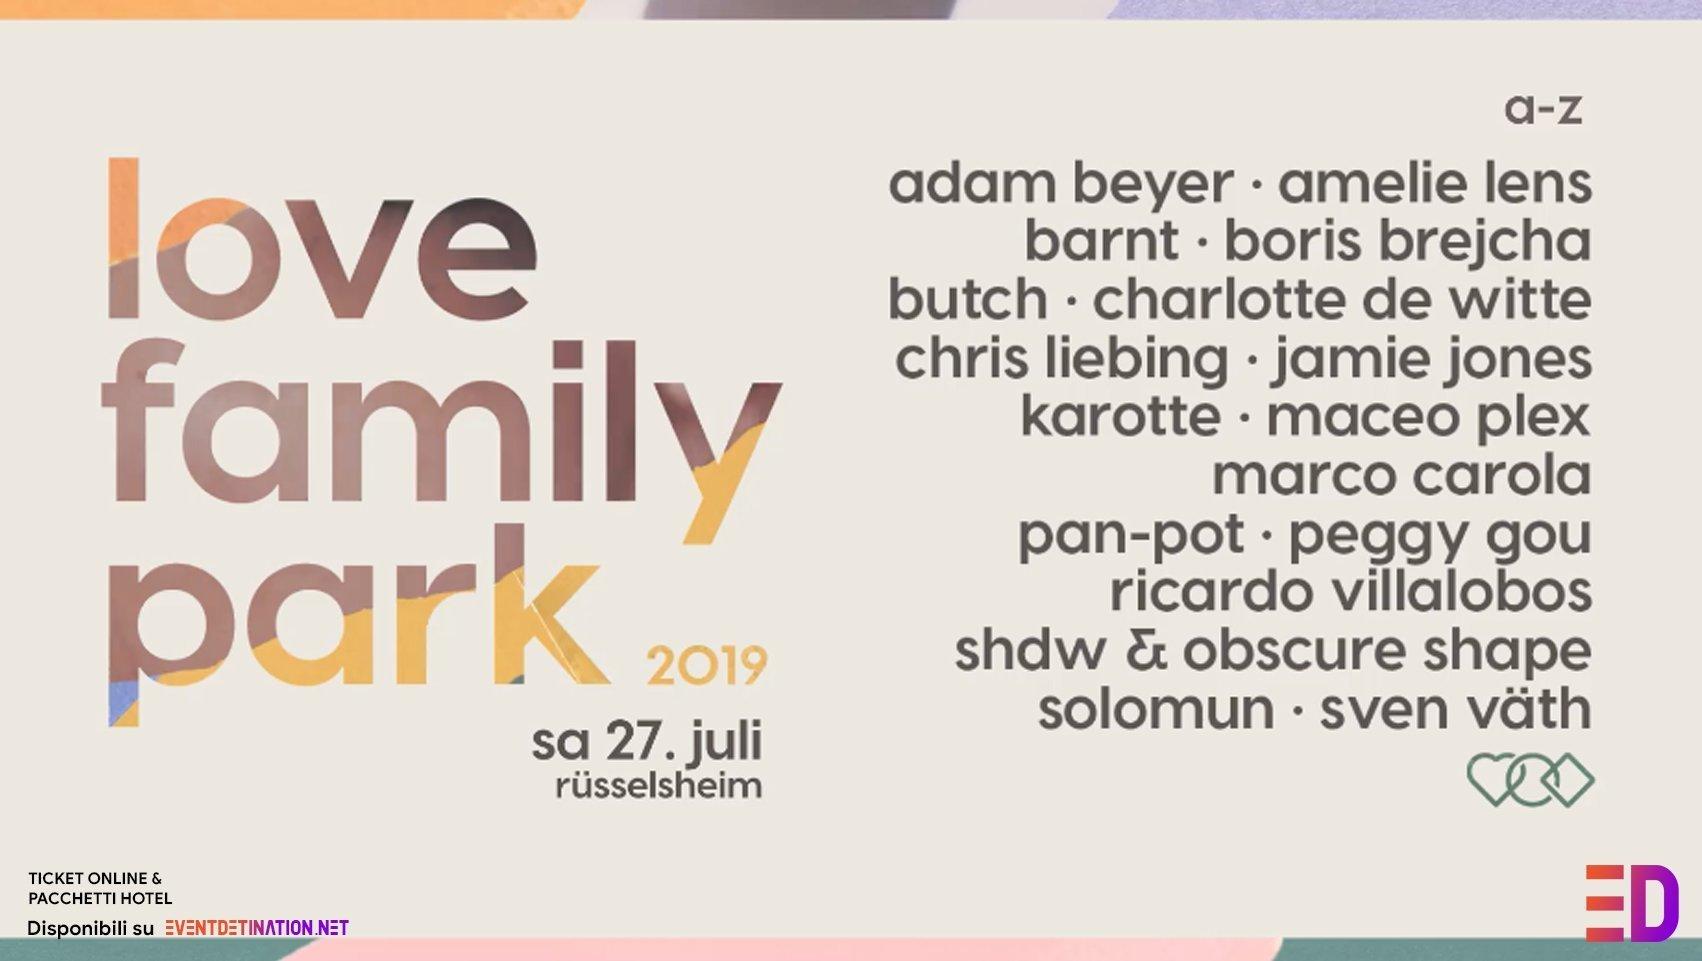 Love Family Park 2019 –  Domenica 27 Luglio 2019 – Mainvorland Rüsselsheim | Ticket E Pacchetti Hotel